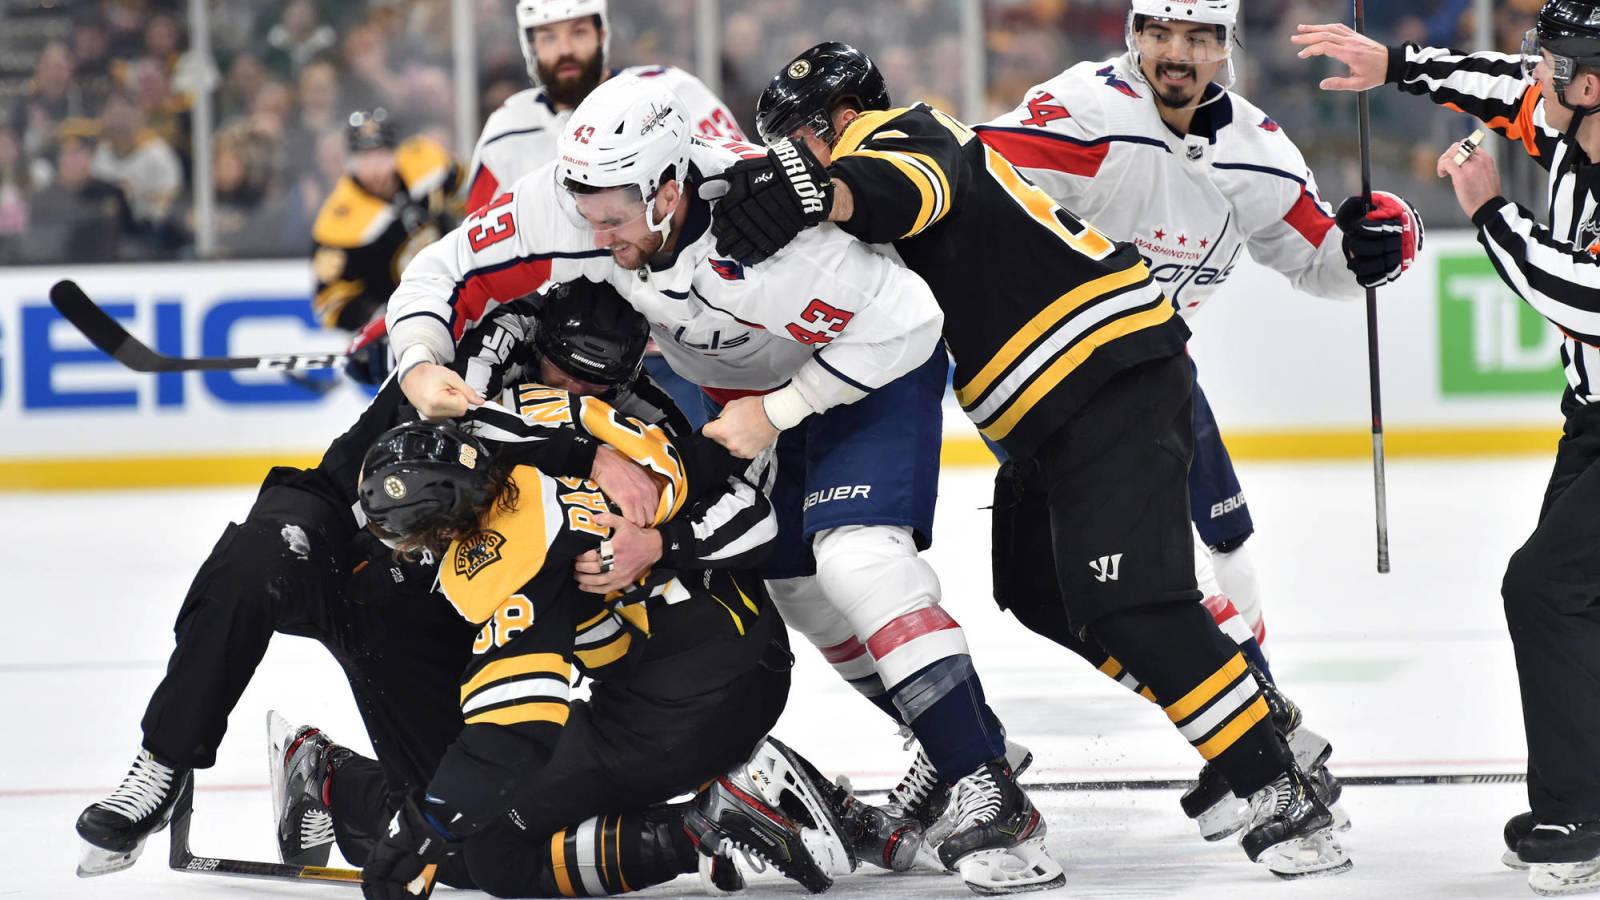 Capitals' Tom Wilson says Bruins' David Pastrnak lost bet that led to wild tweet